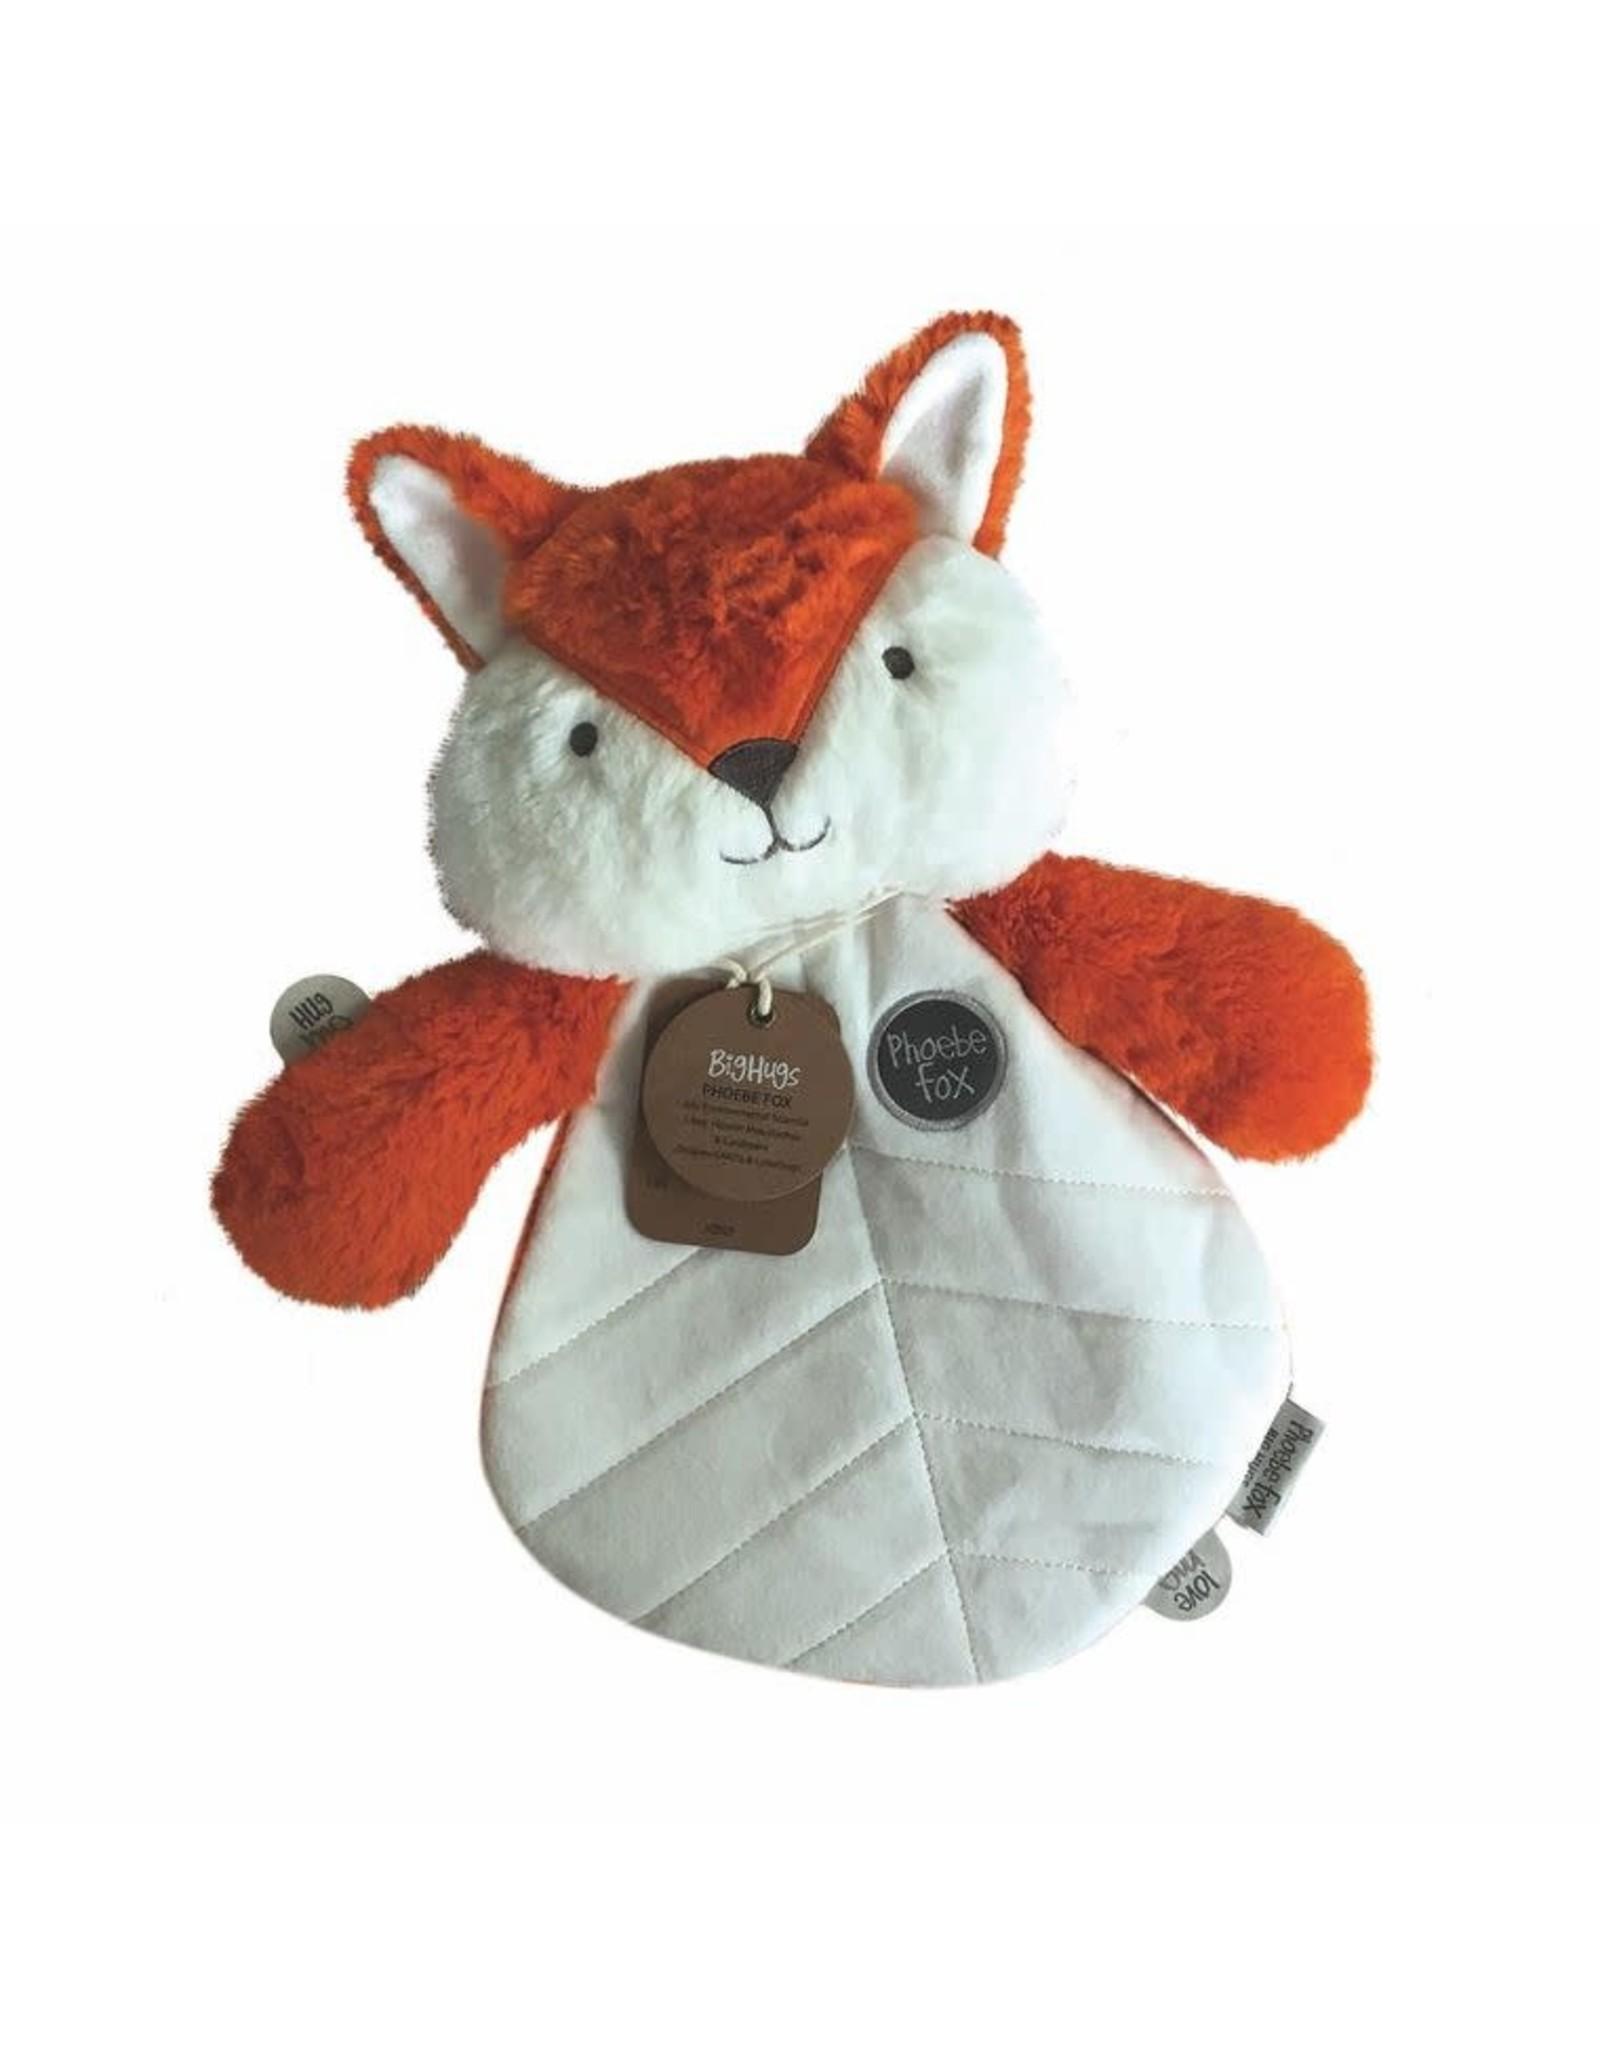 O.B. Designs Phoebe Fox Lovey Toy